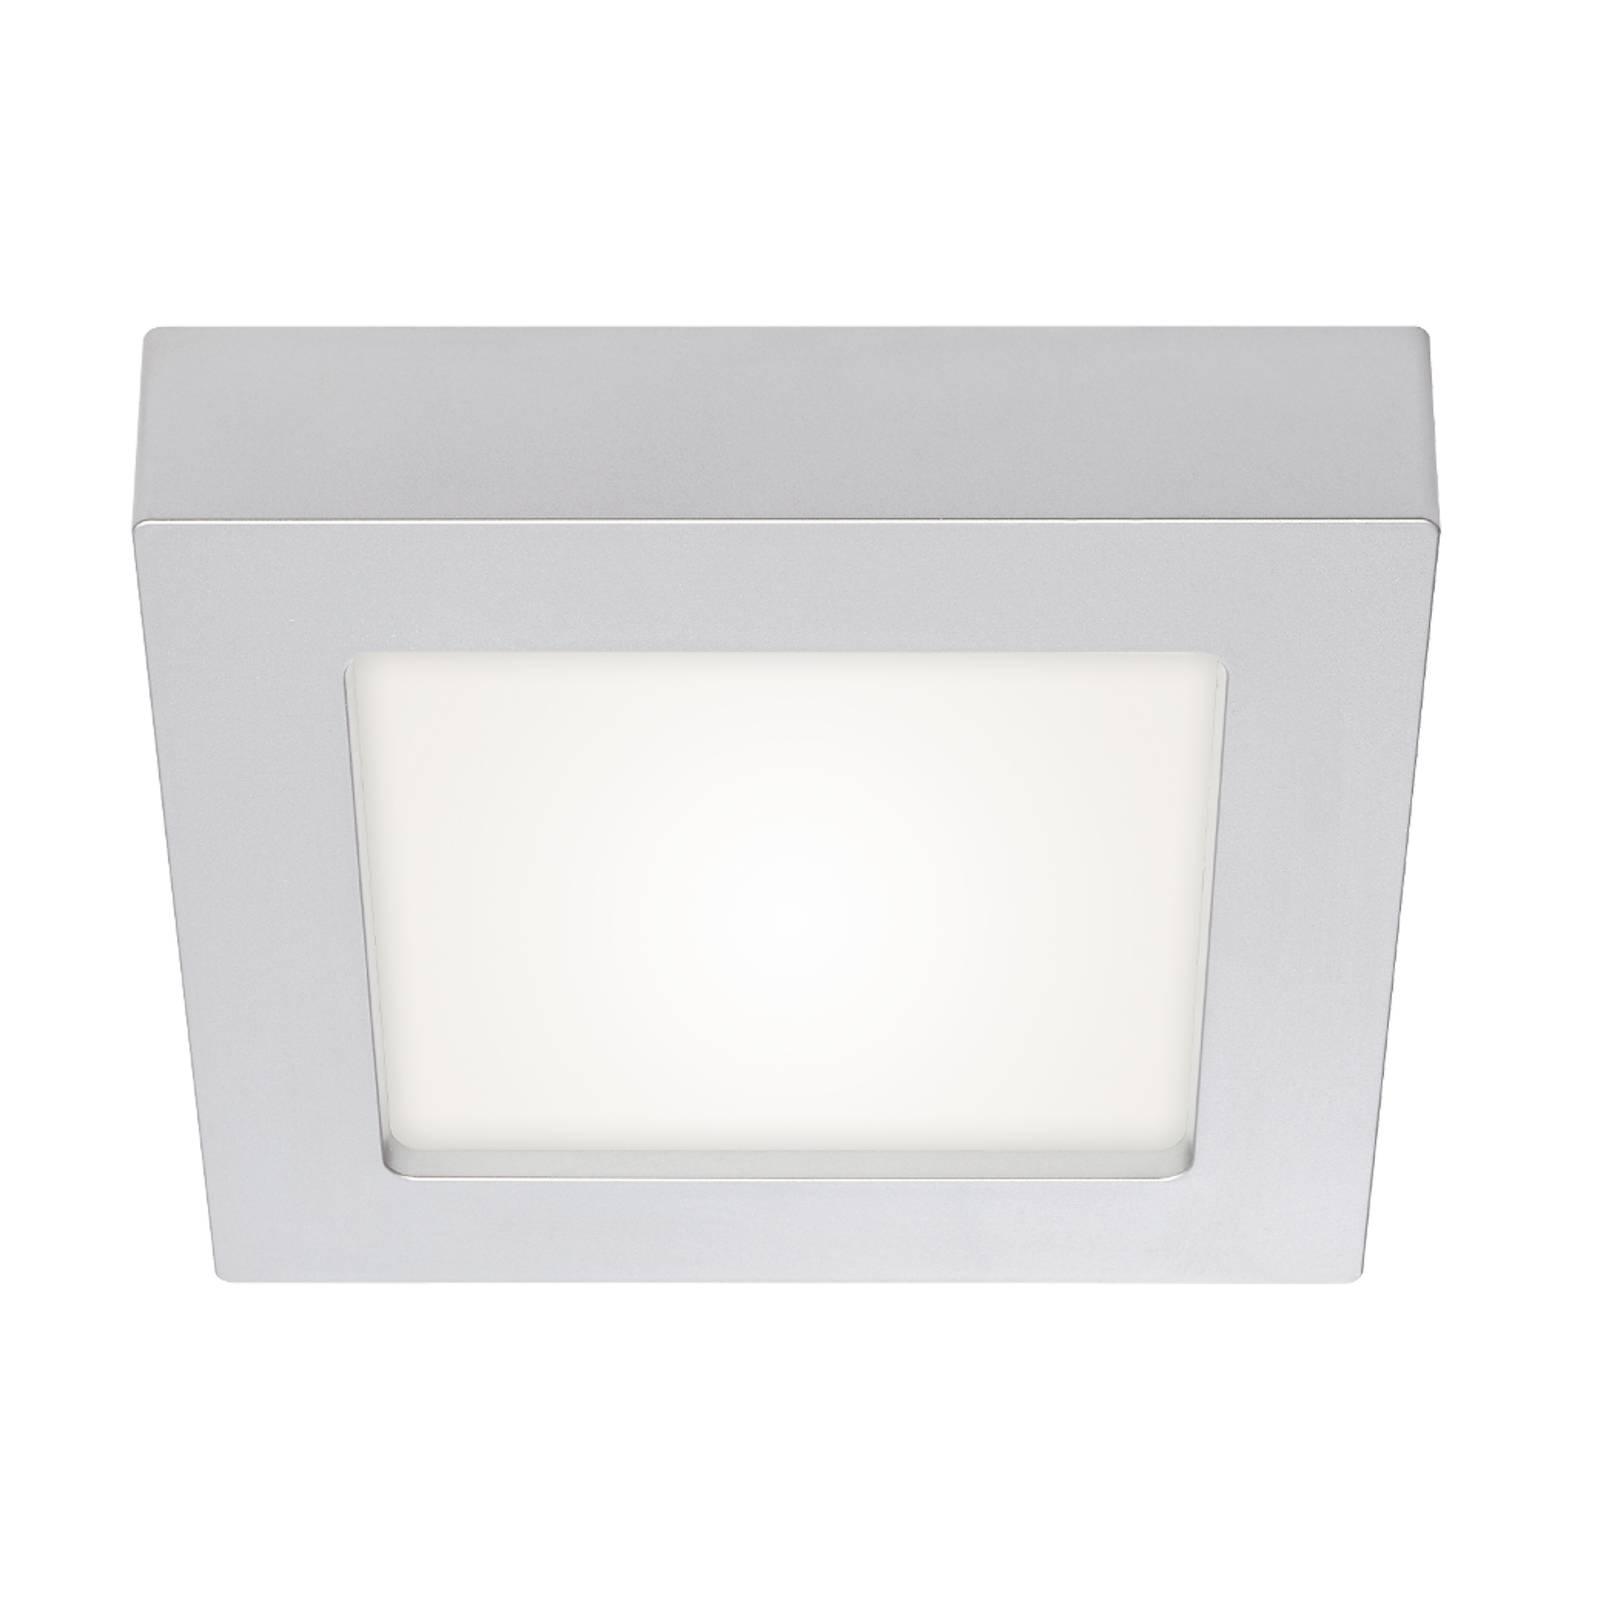 Prios Alette -LED-kattovalaisin, hopea 22,7 cm 24W